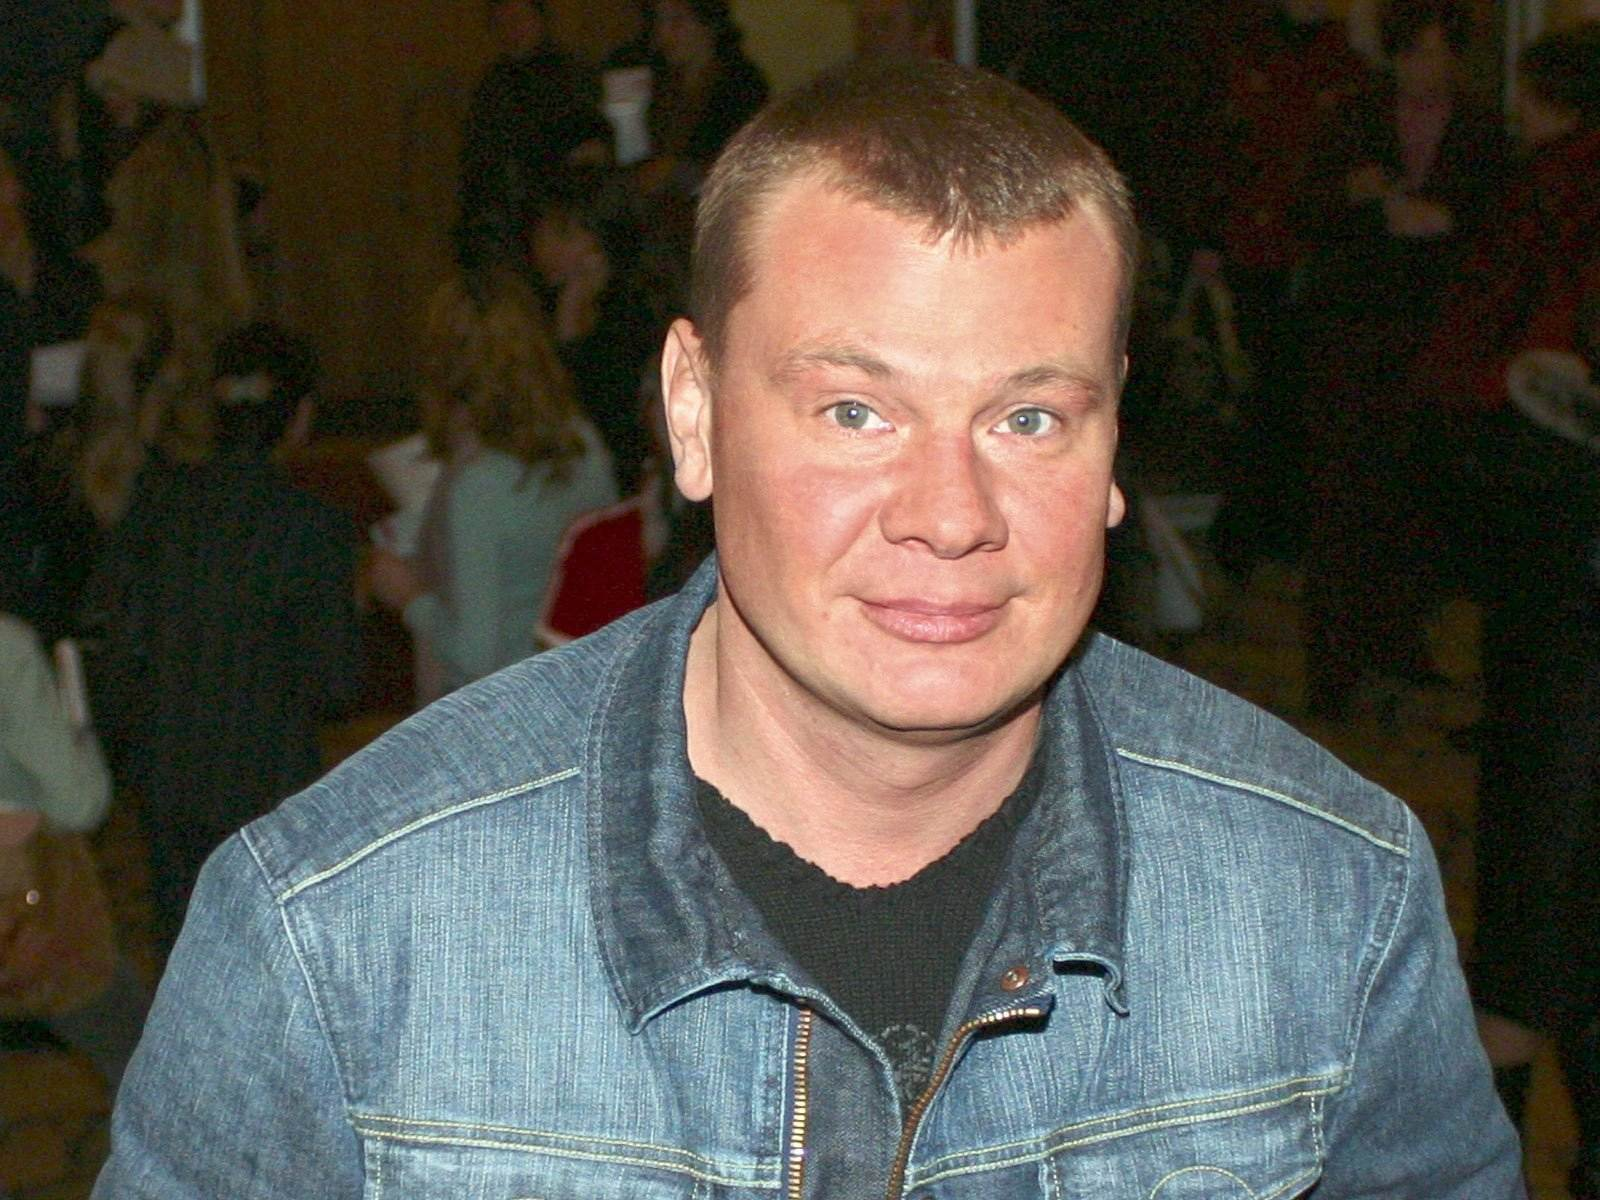 Рост, вес, возраст. Года жизни Владислава Галкина фото